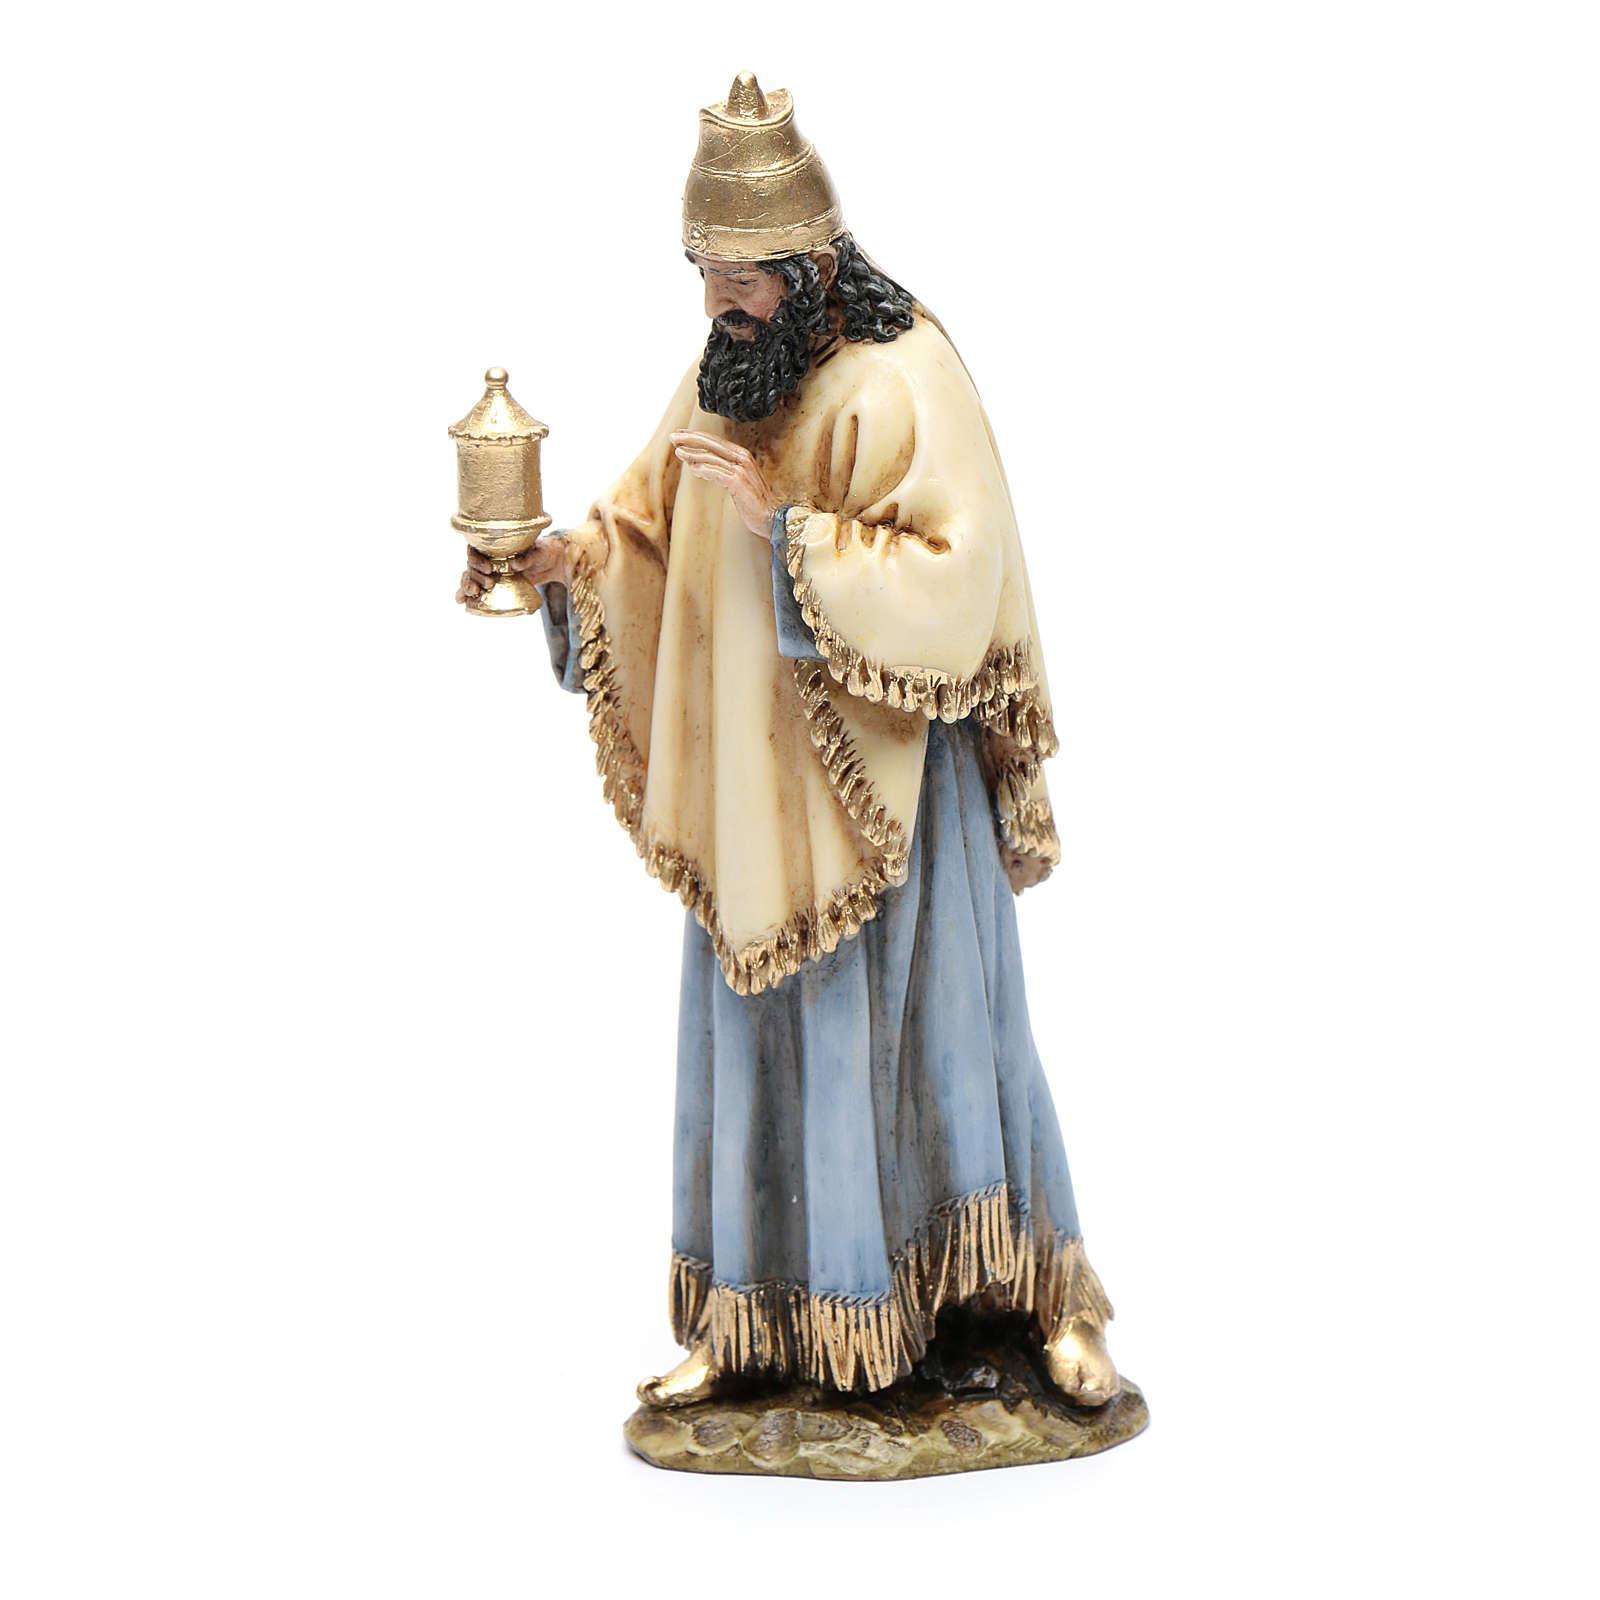 Saracen Wise King 15cm, Moranduzzo 4